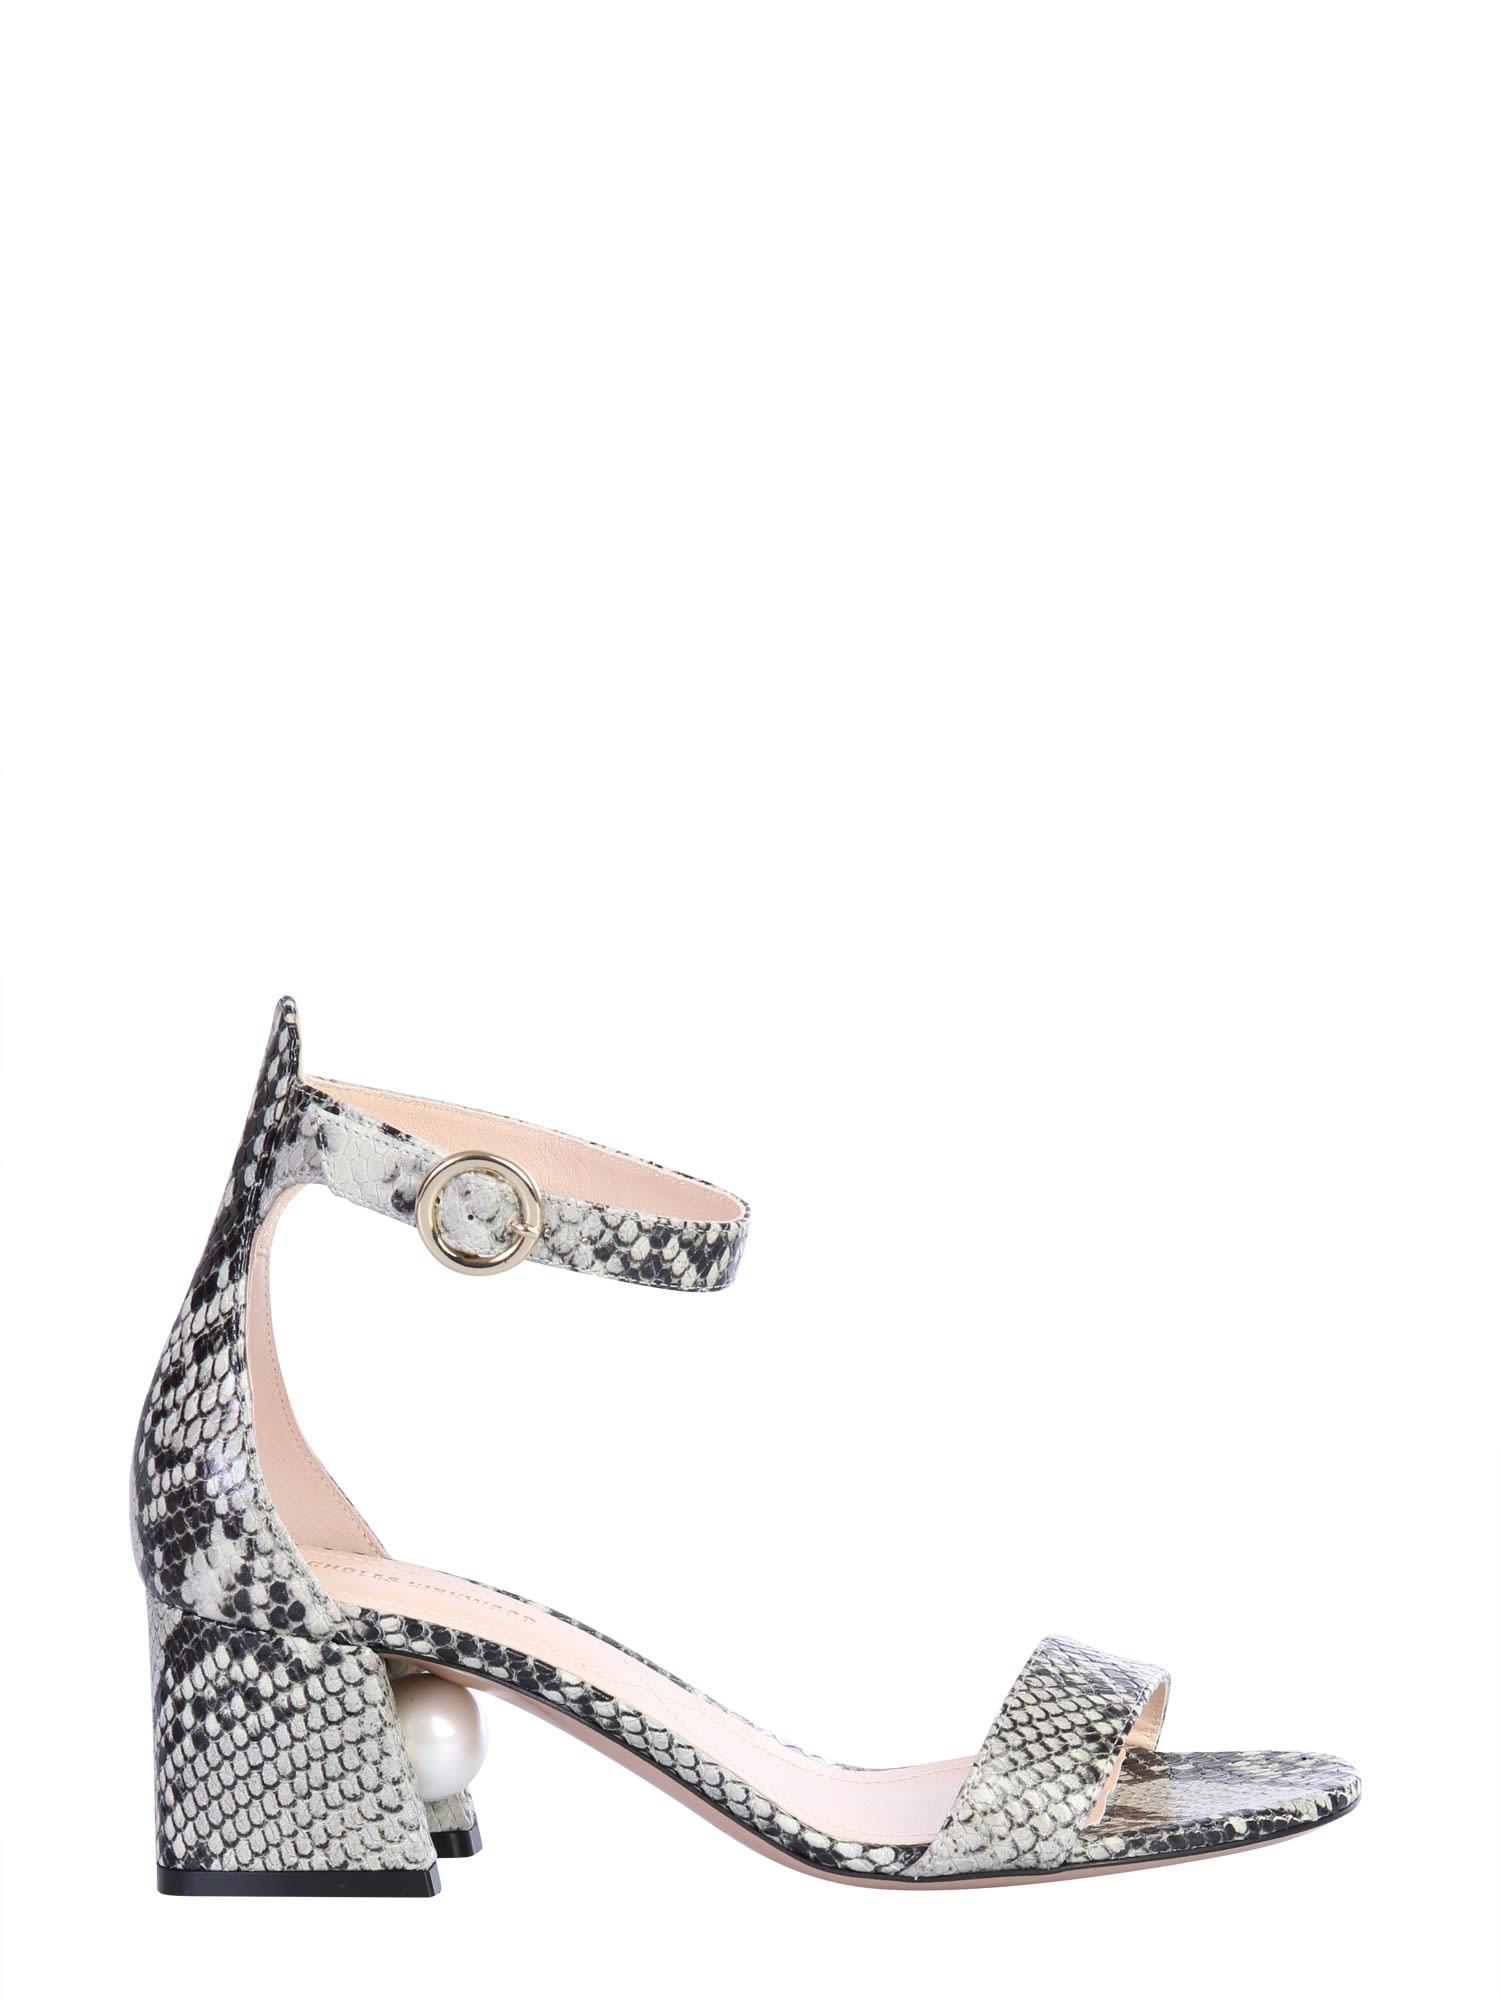 Buy Nicholas Kirkwood Miri Sandals online, shop Nicholas Kirkwood shoes with free shipping